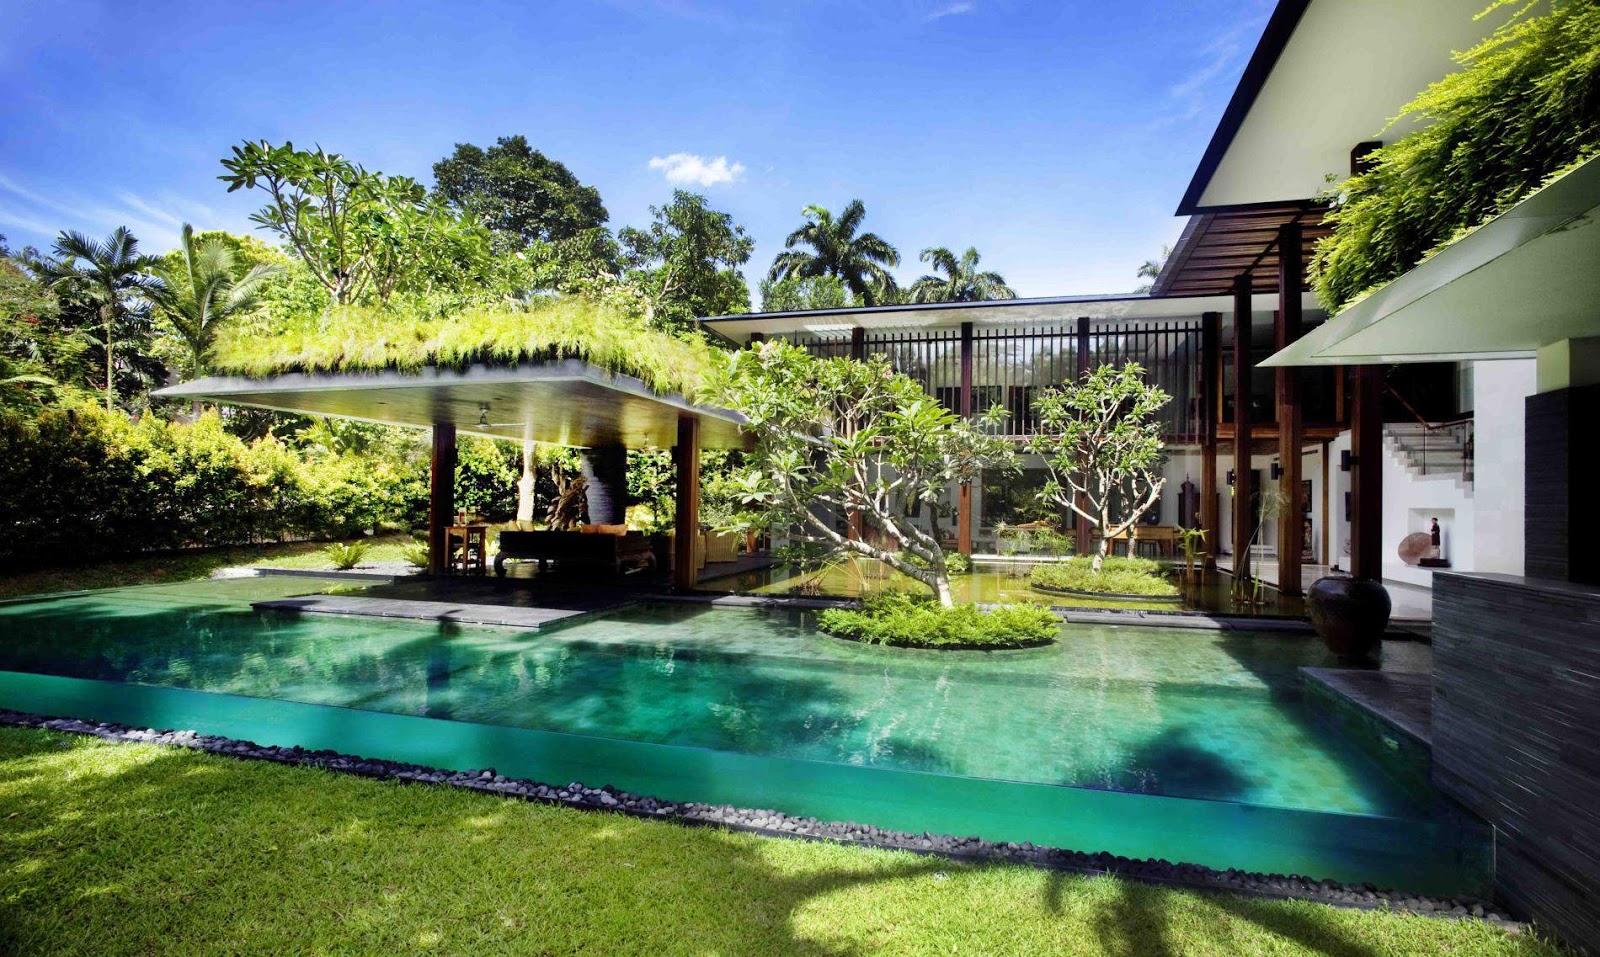 Contemporary Tropical House, Tanga House - Modern home ... on Mansion Backyard Ideas id=14987